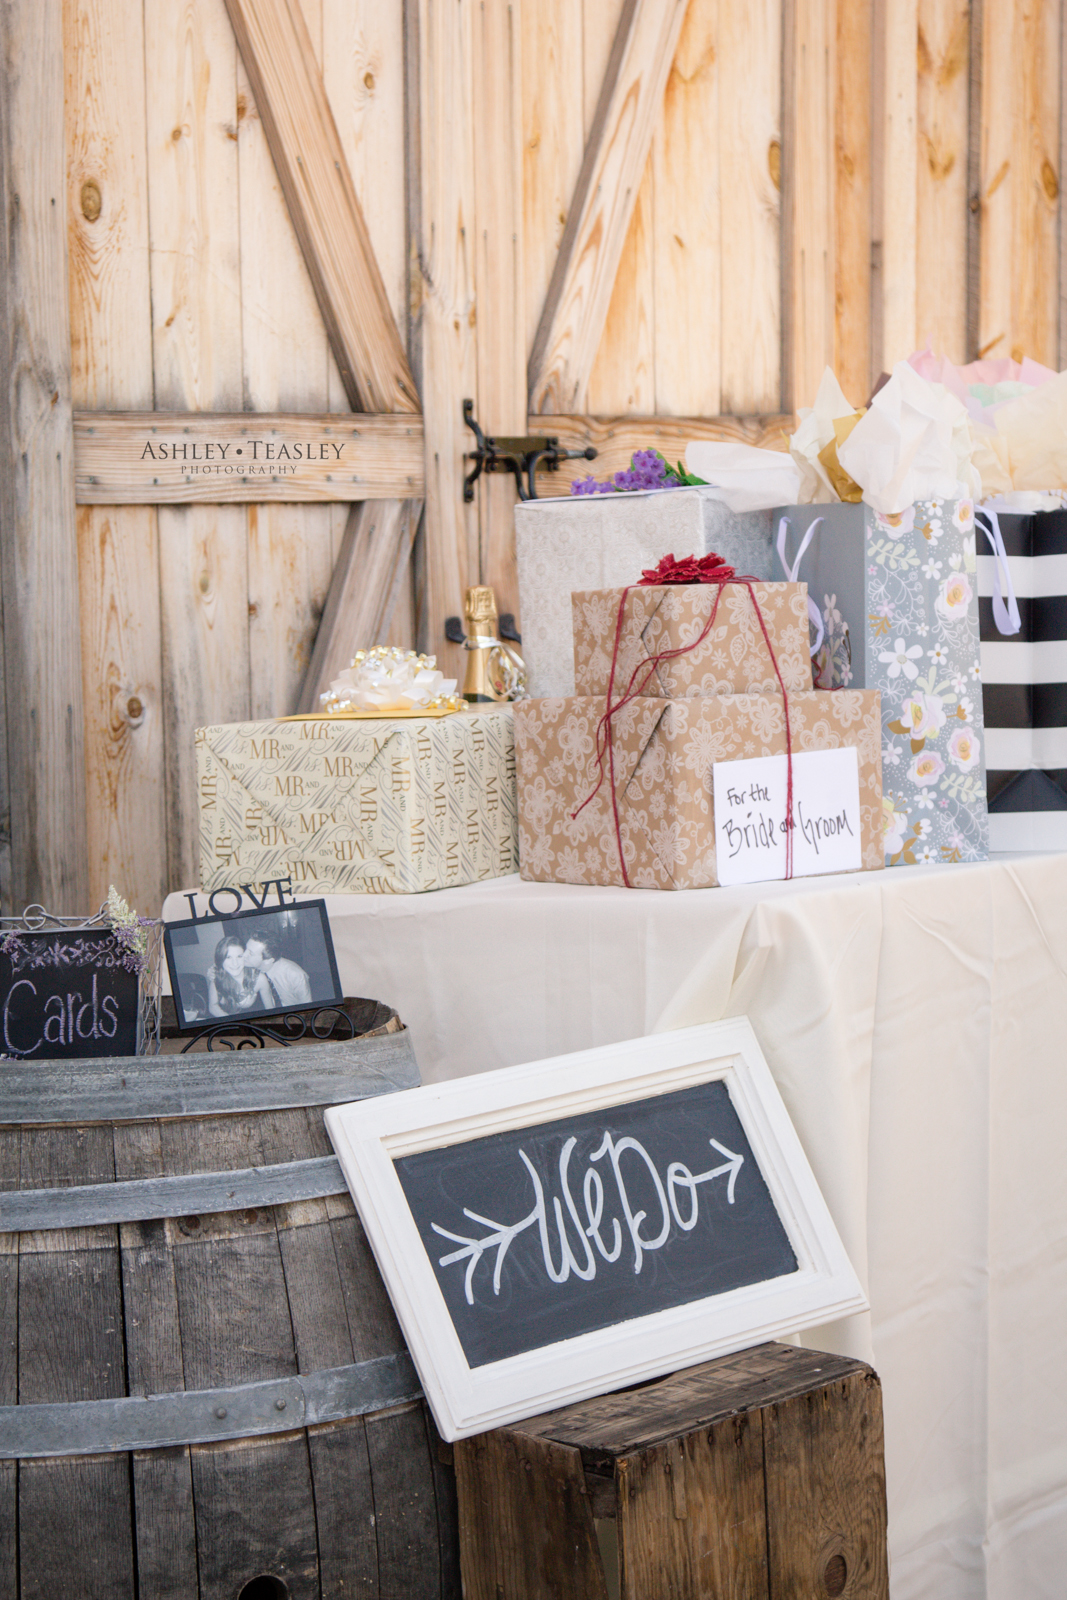 Ashley Teasley Photography - Amador Cellars Winery - Sacramento Wedding Photographer-110.JPG